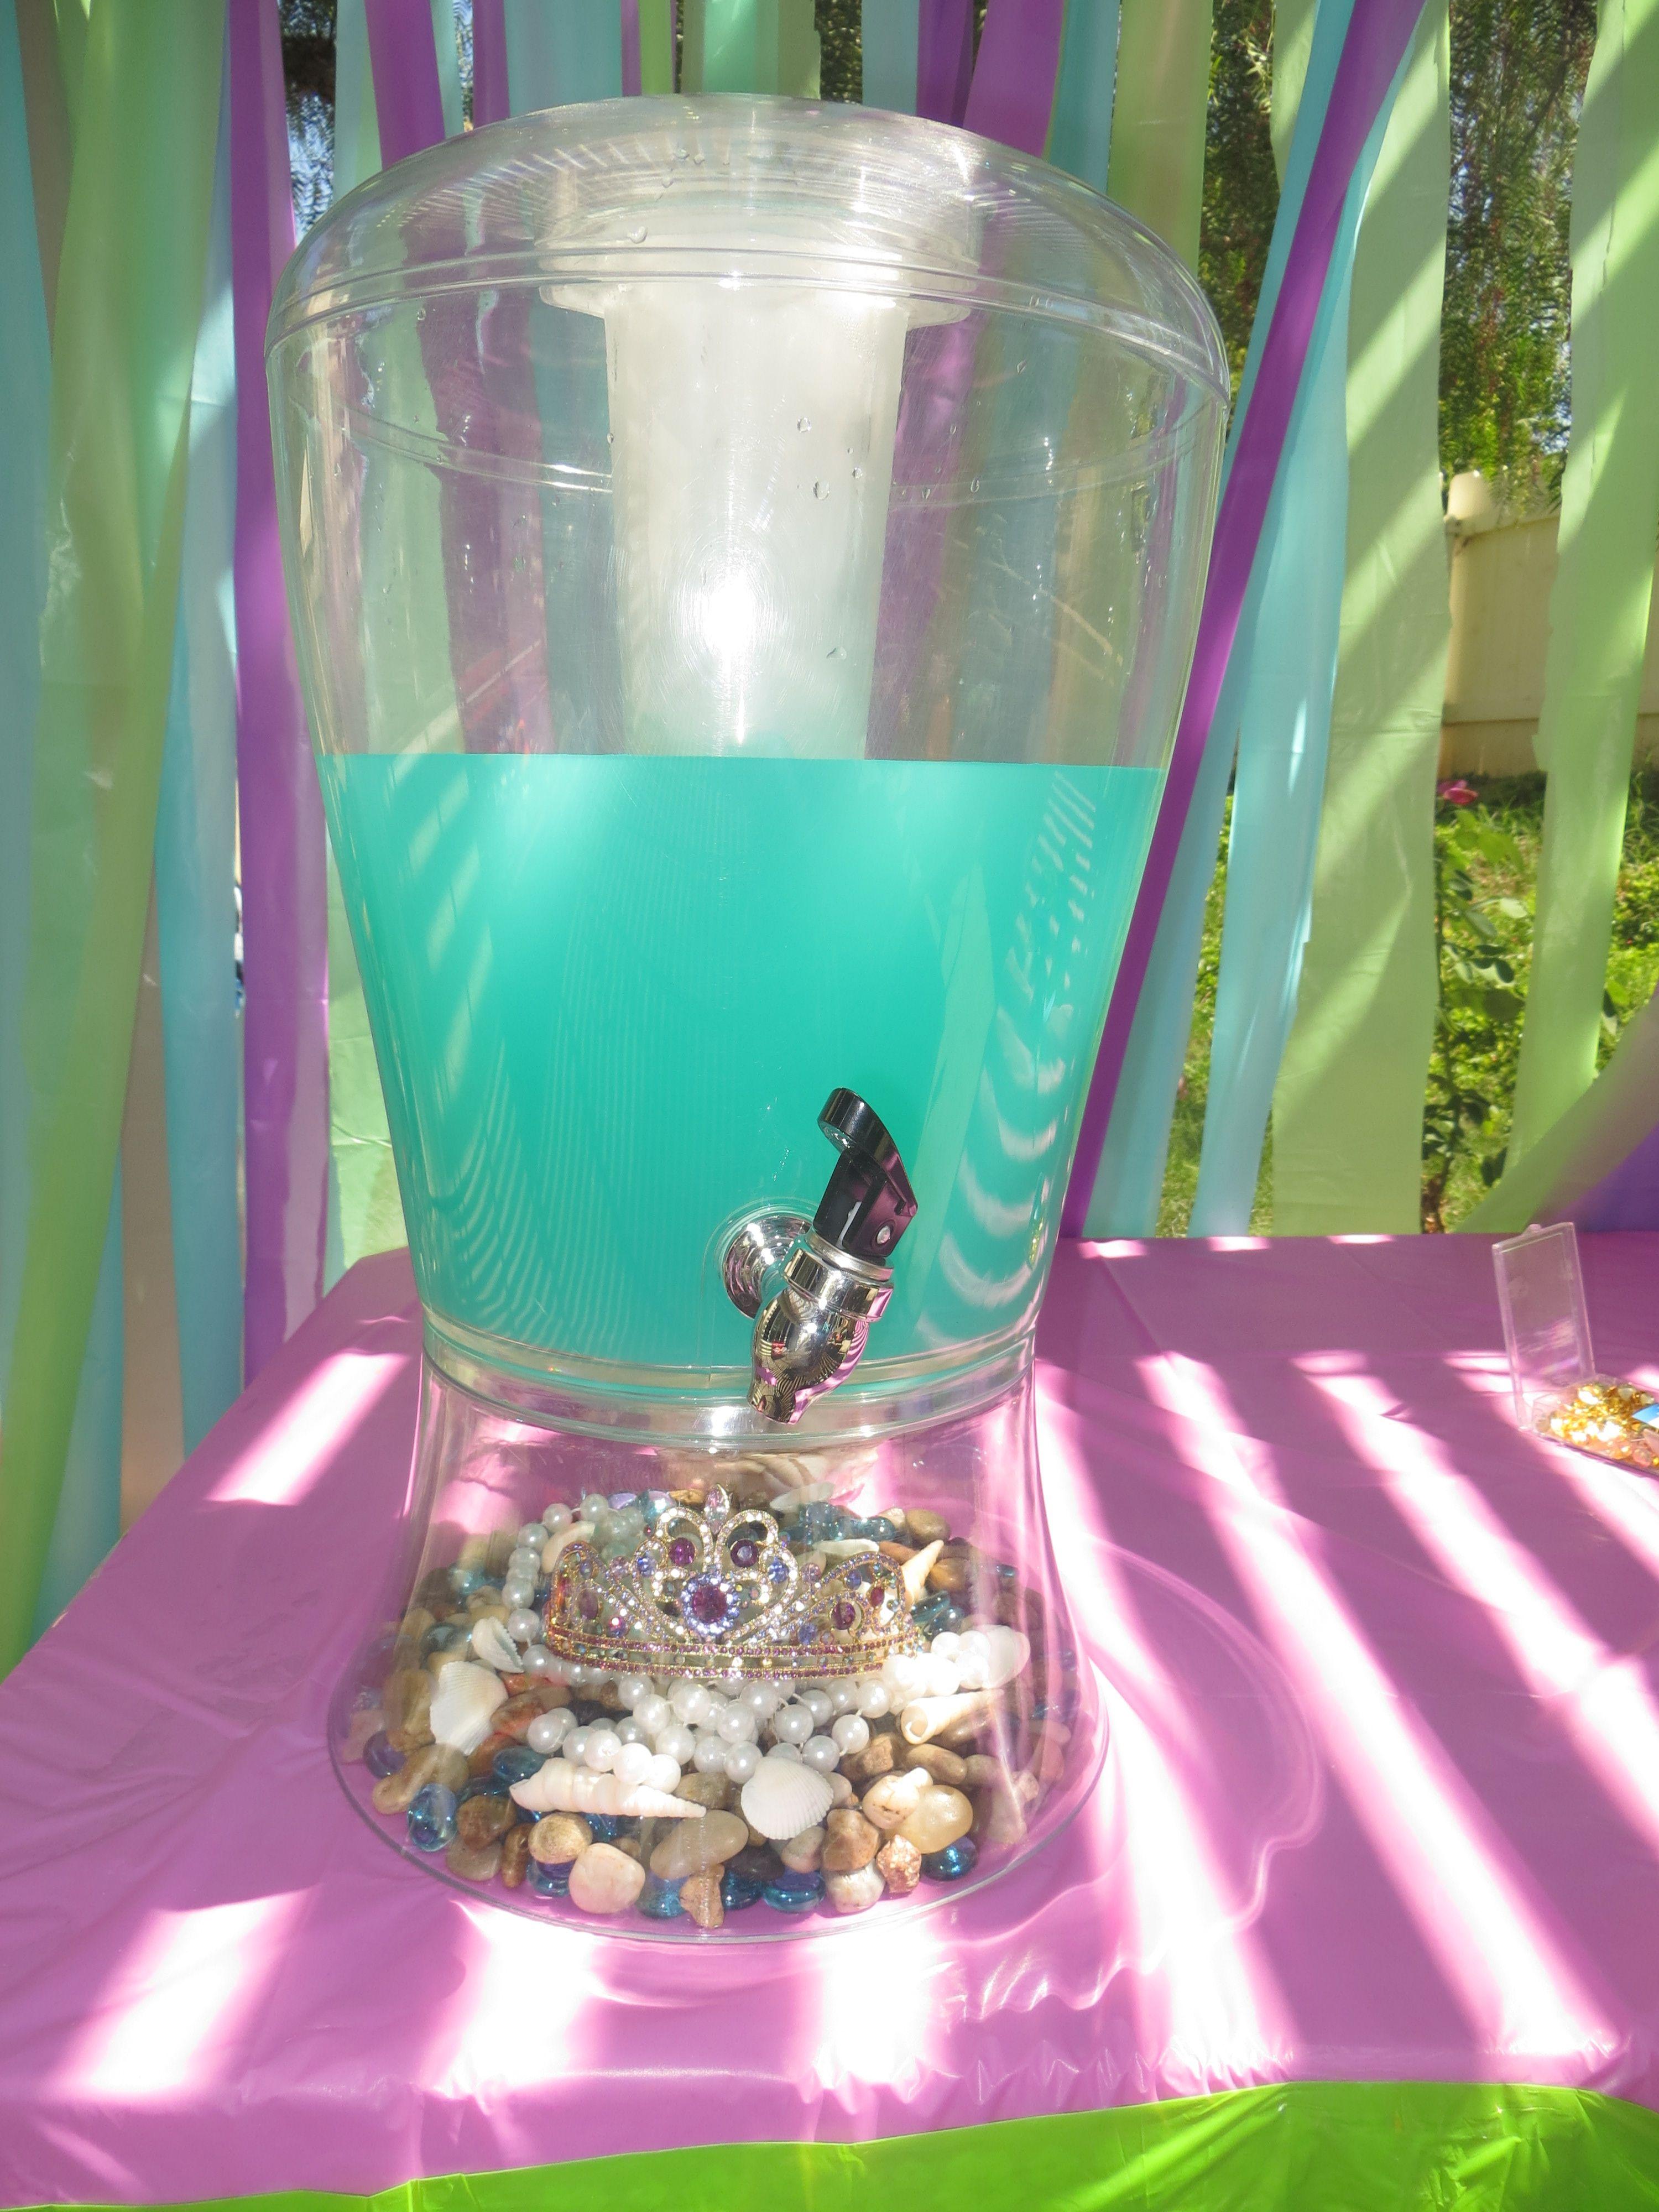 Little Mermaid Drink Station My Creations Pinterest Mermaid